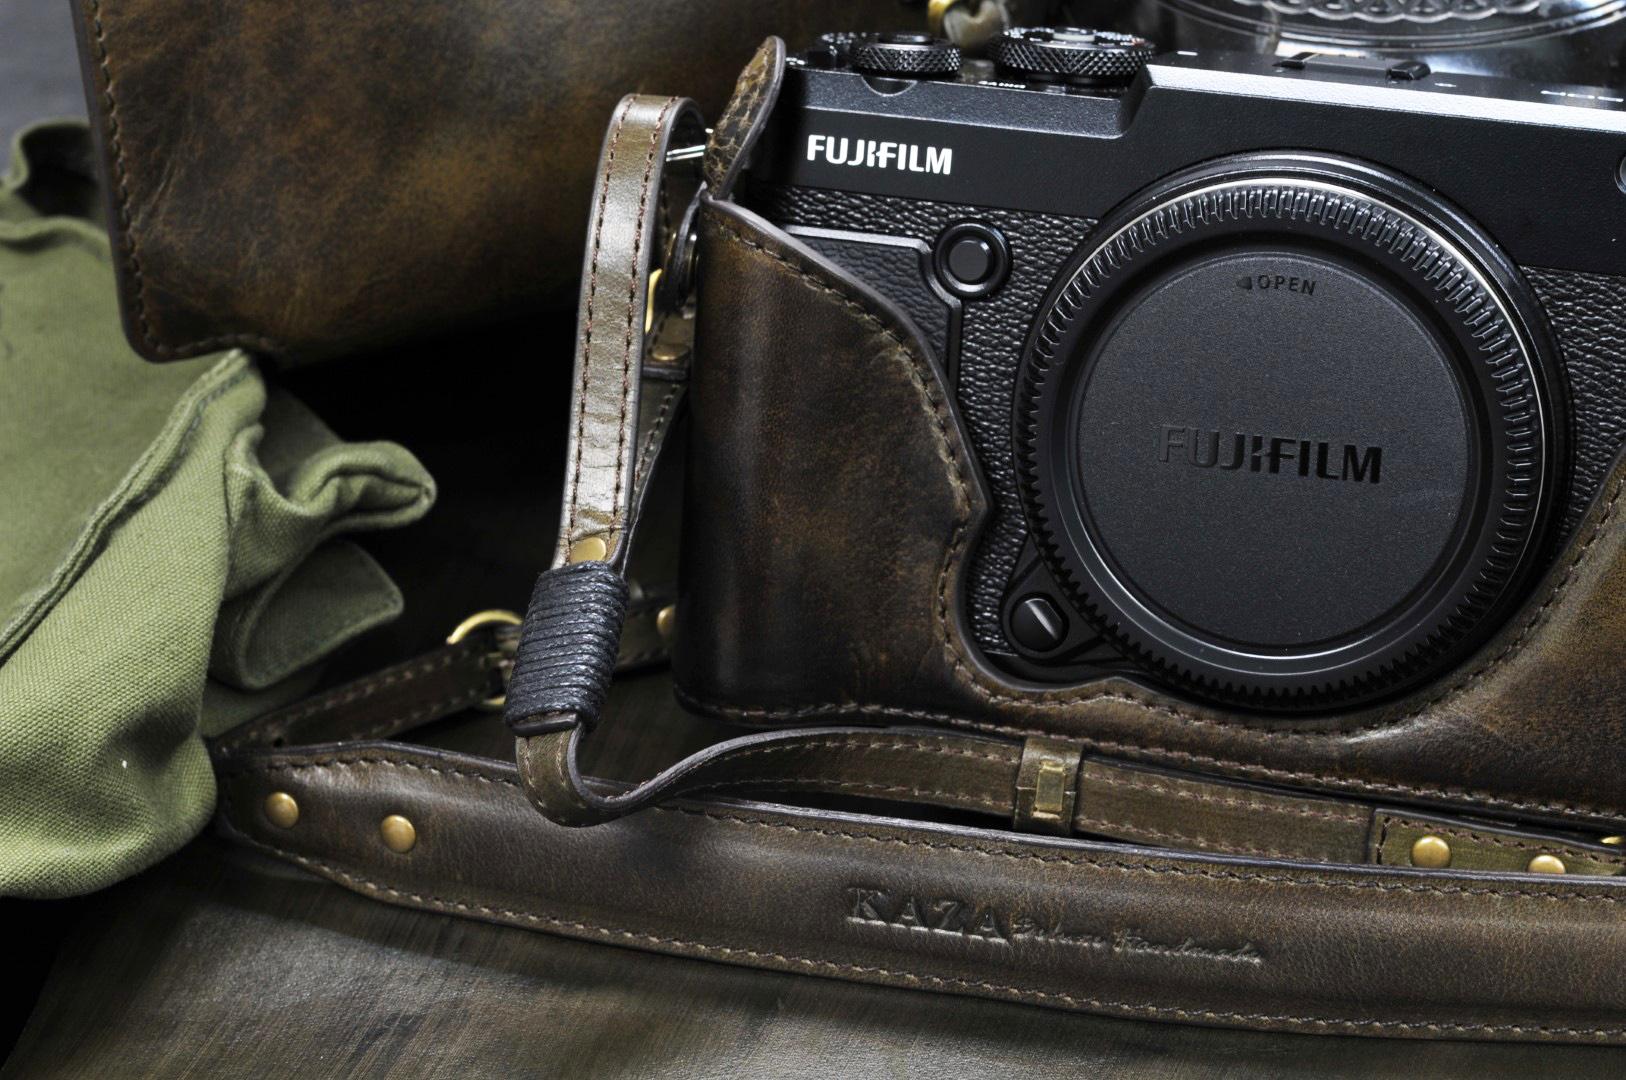 GFX50r leather half case,GFX50R leather half case,gfx50r 相機皮套,gfx50r 革のケース